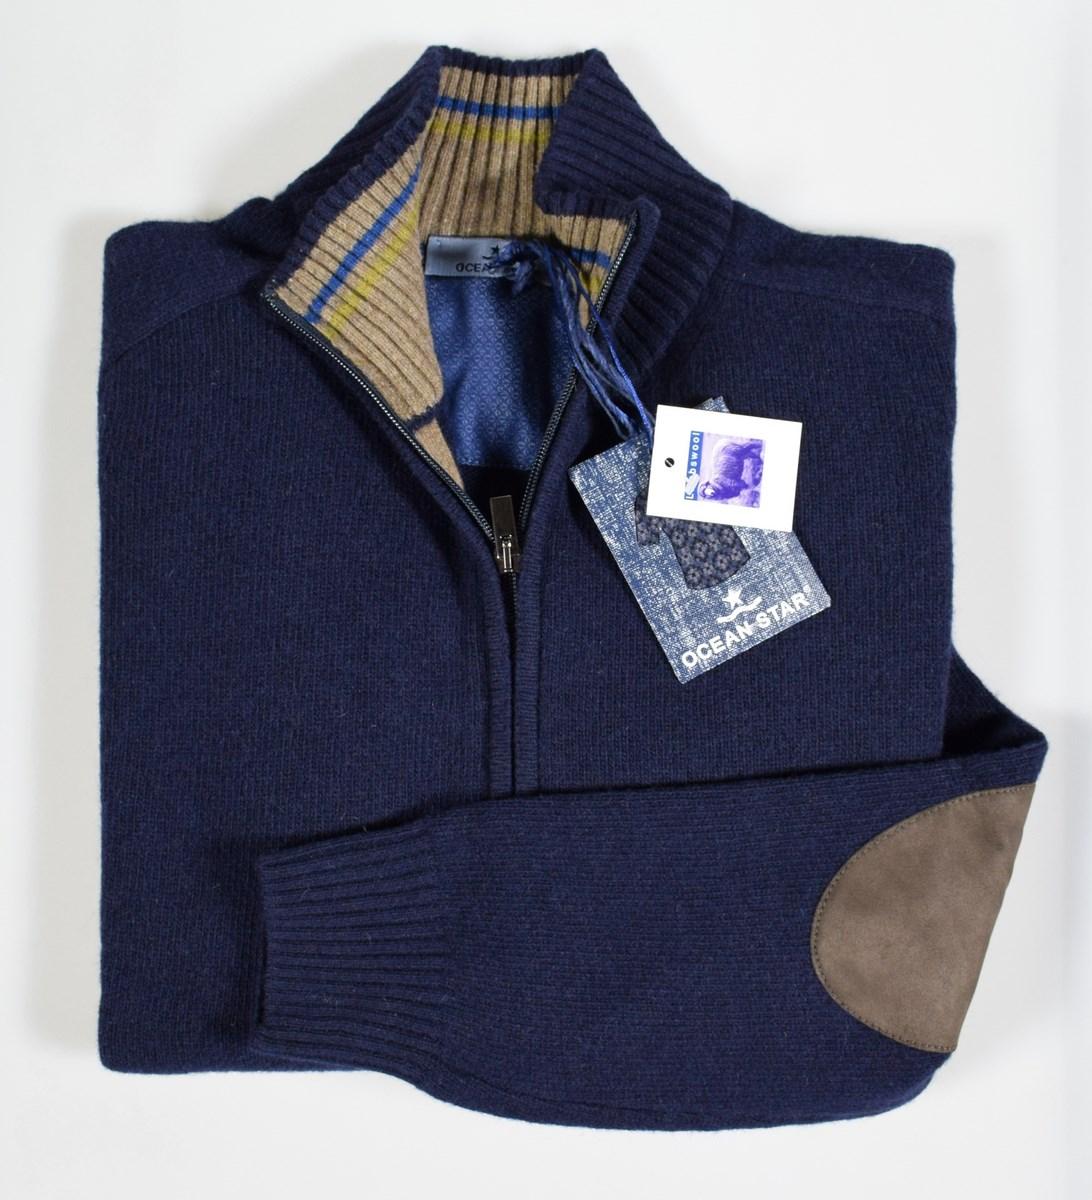 8d5116c4e1 Cardigan da uomo con zip Ocean Star in lana lambswool tre colori ...